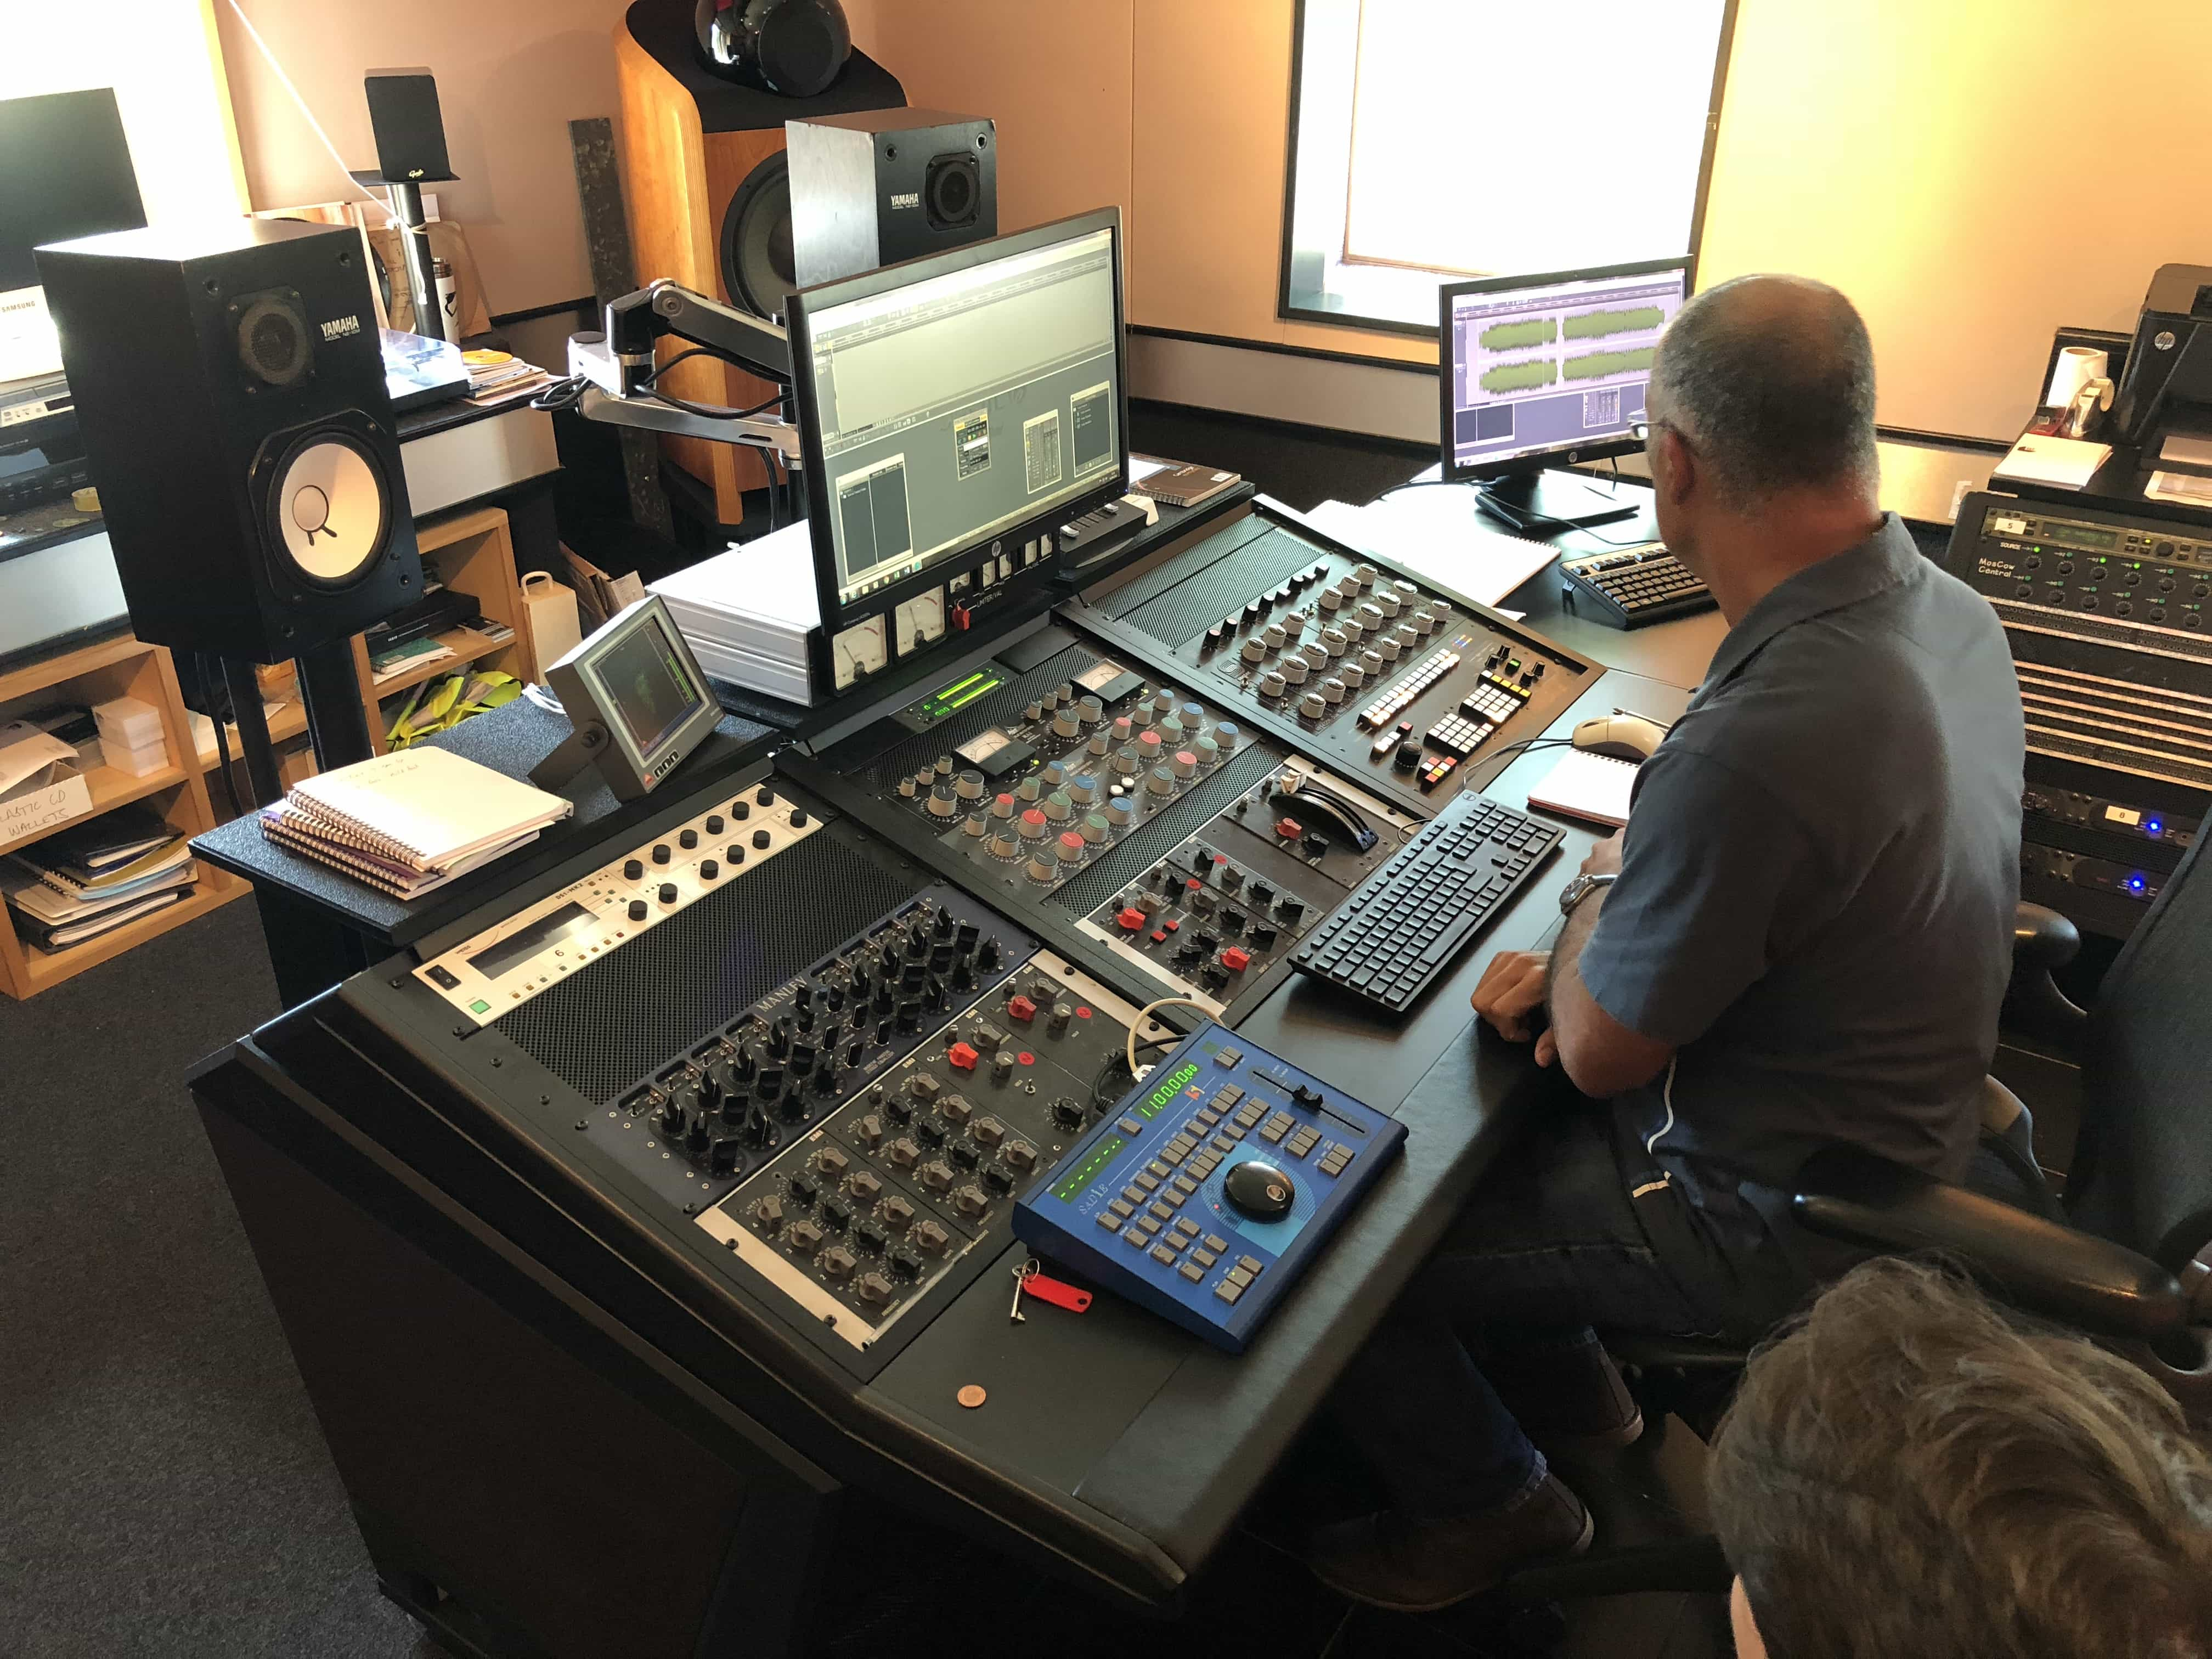 Geoff Pesche at the EMI TG123410 mastering console